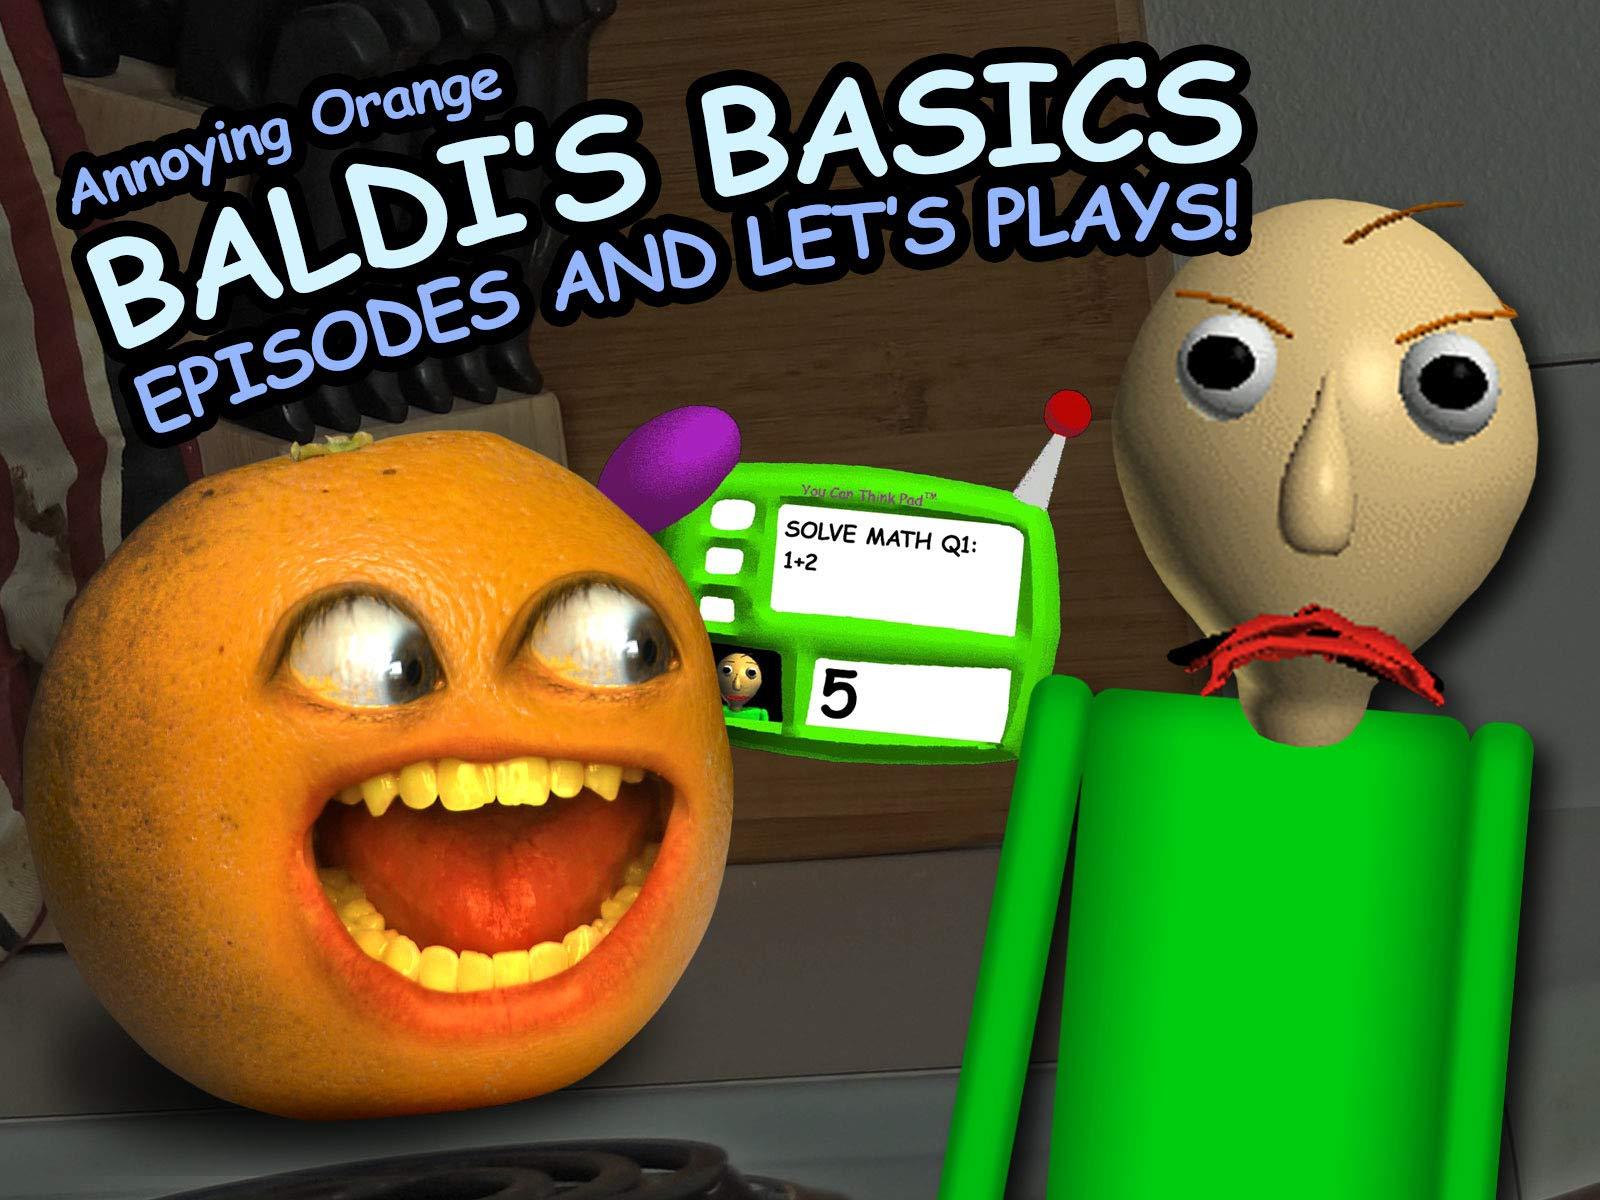 Clip: Annoying Orange - Baldi's Basics Episodes and Let's Plays!